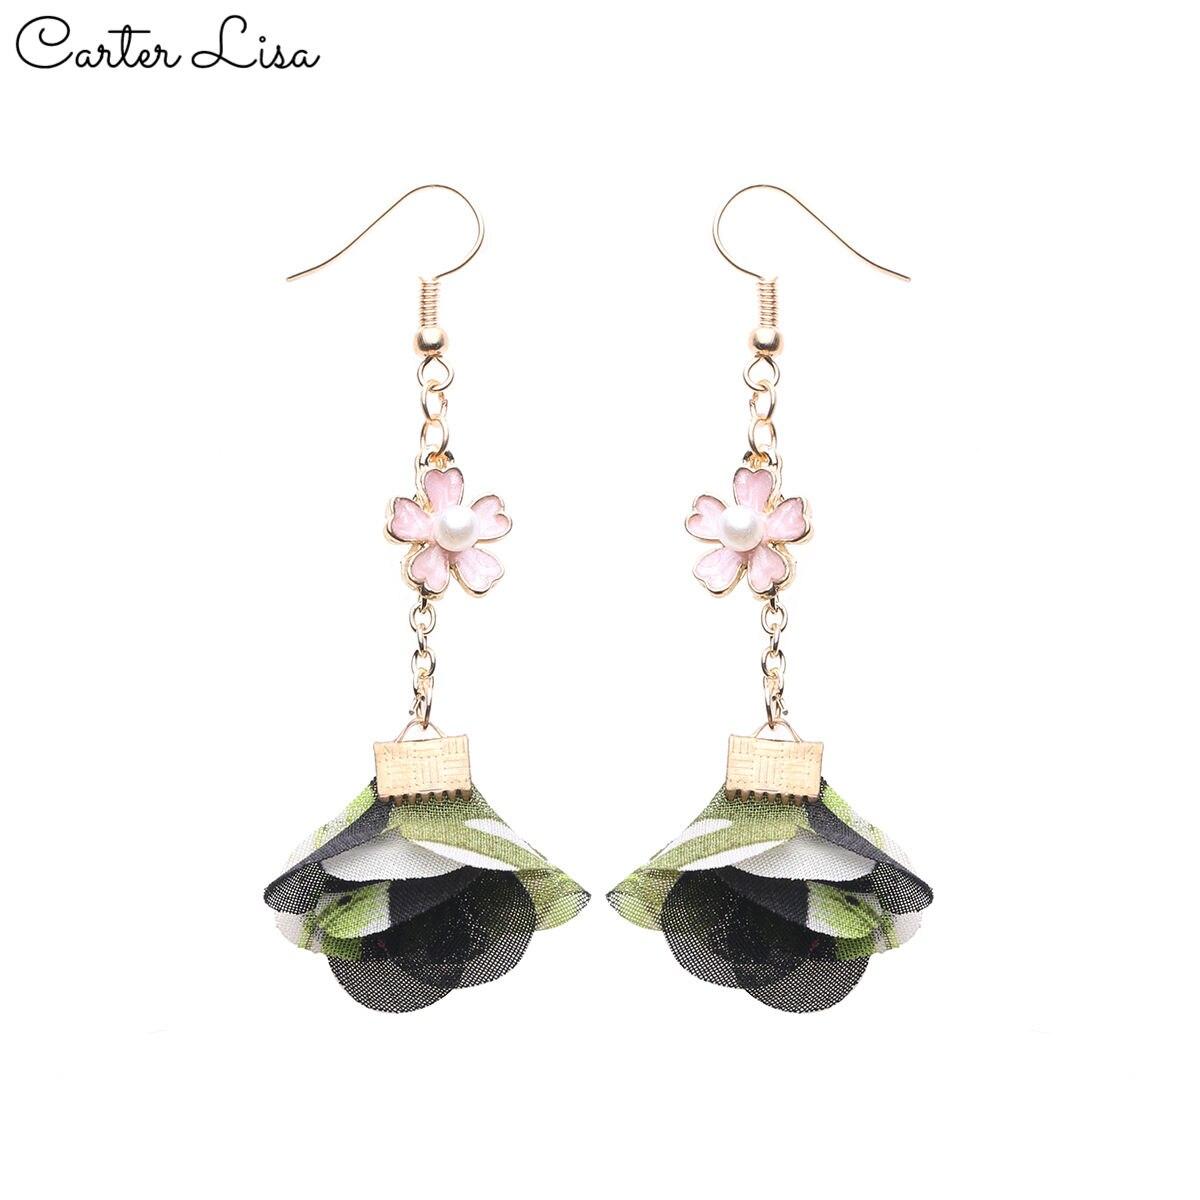 CARTER LISA 2019 New Hot Bohemian Women Dangle Earrings Fresh Frosted Petals Dripping Earrings For Women Jewelry HDEA-068